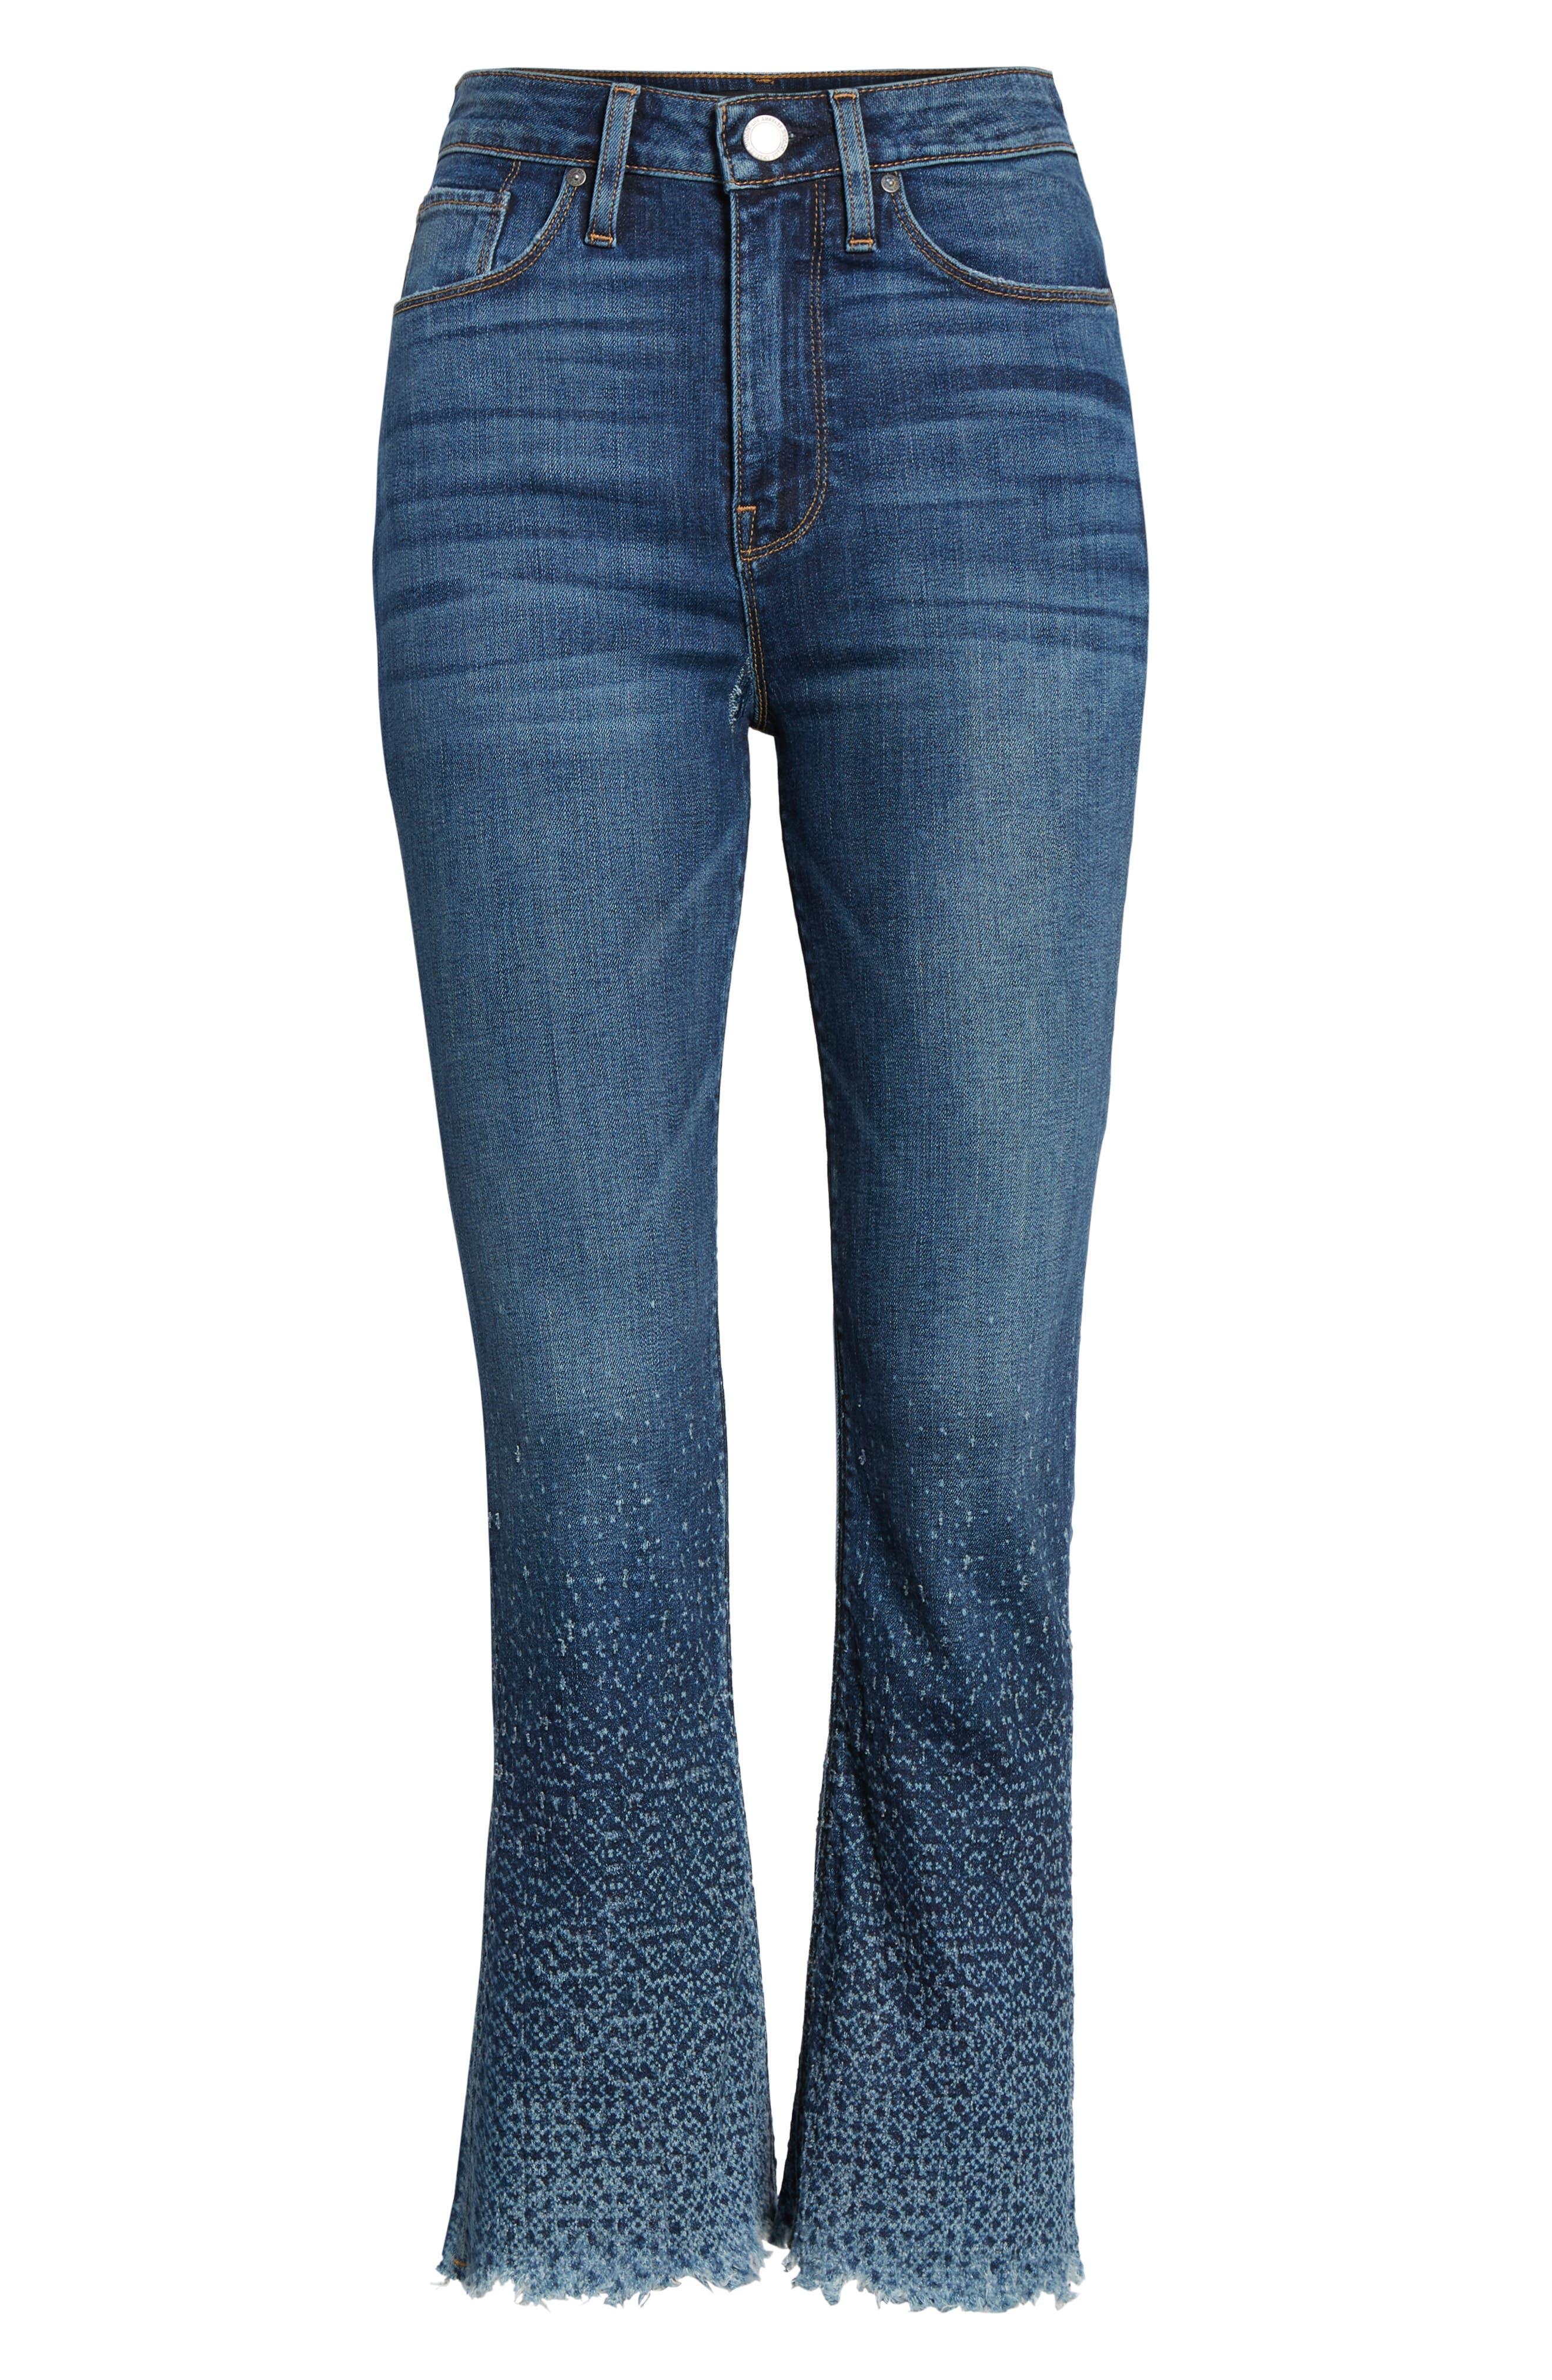 Holly High Waist Crop Flare Jeans,                             Alternate thumbnail 6, color,                             DIST. SUNDOWN DISTRESSED